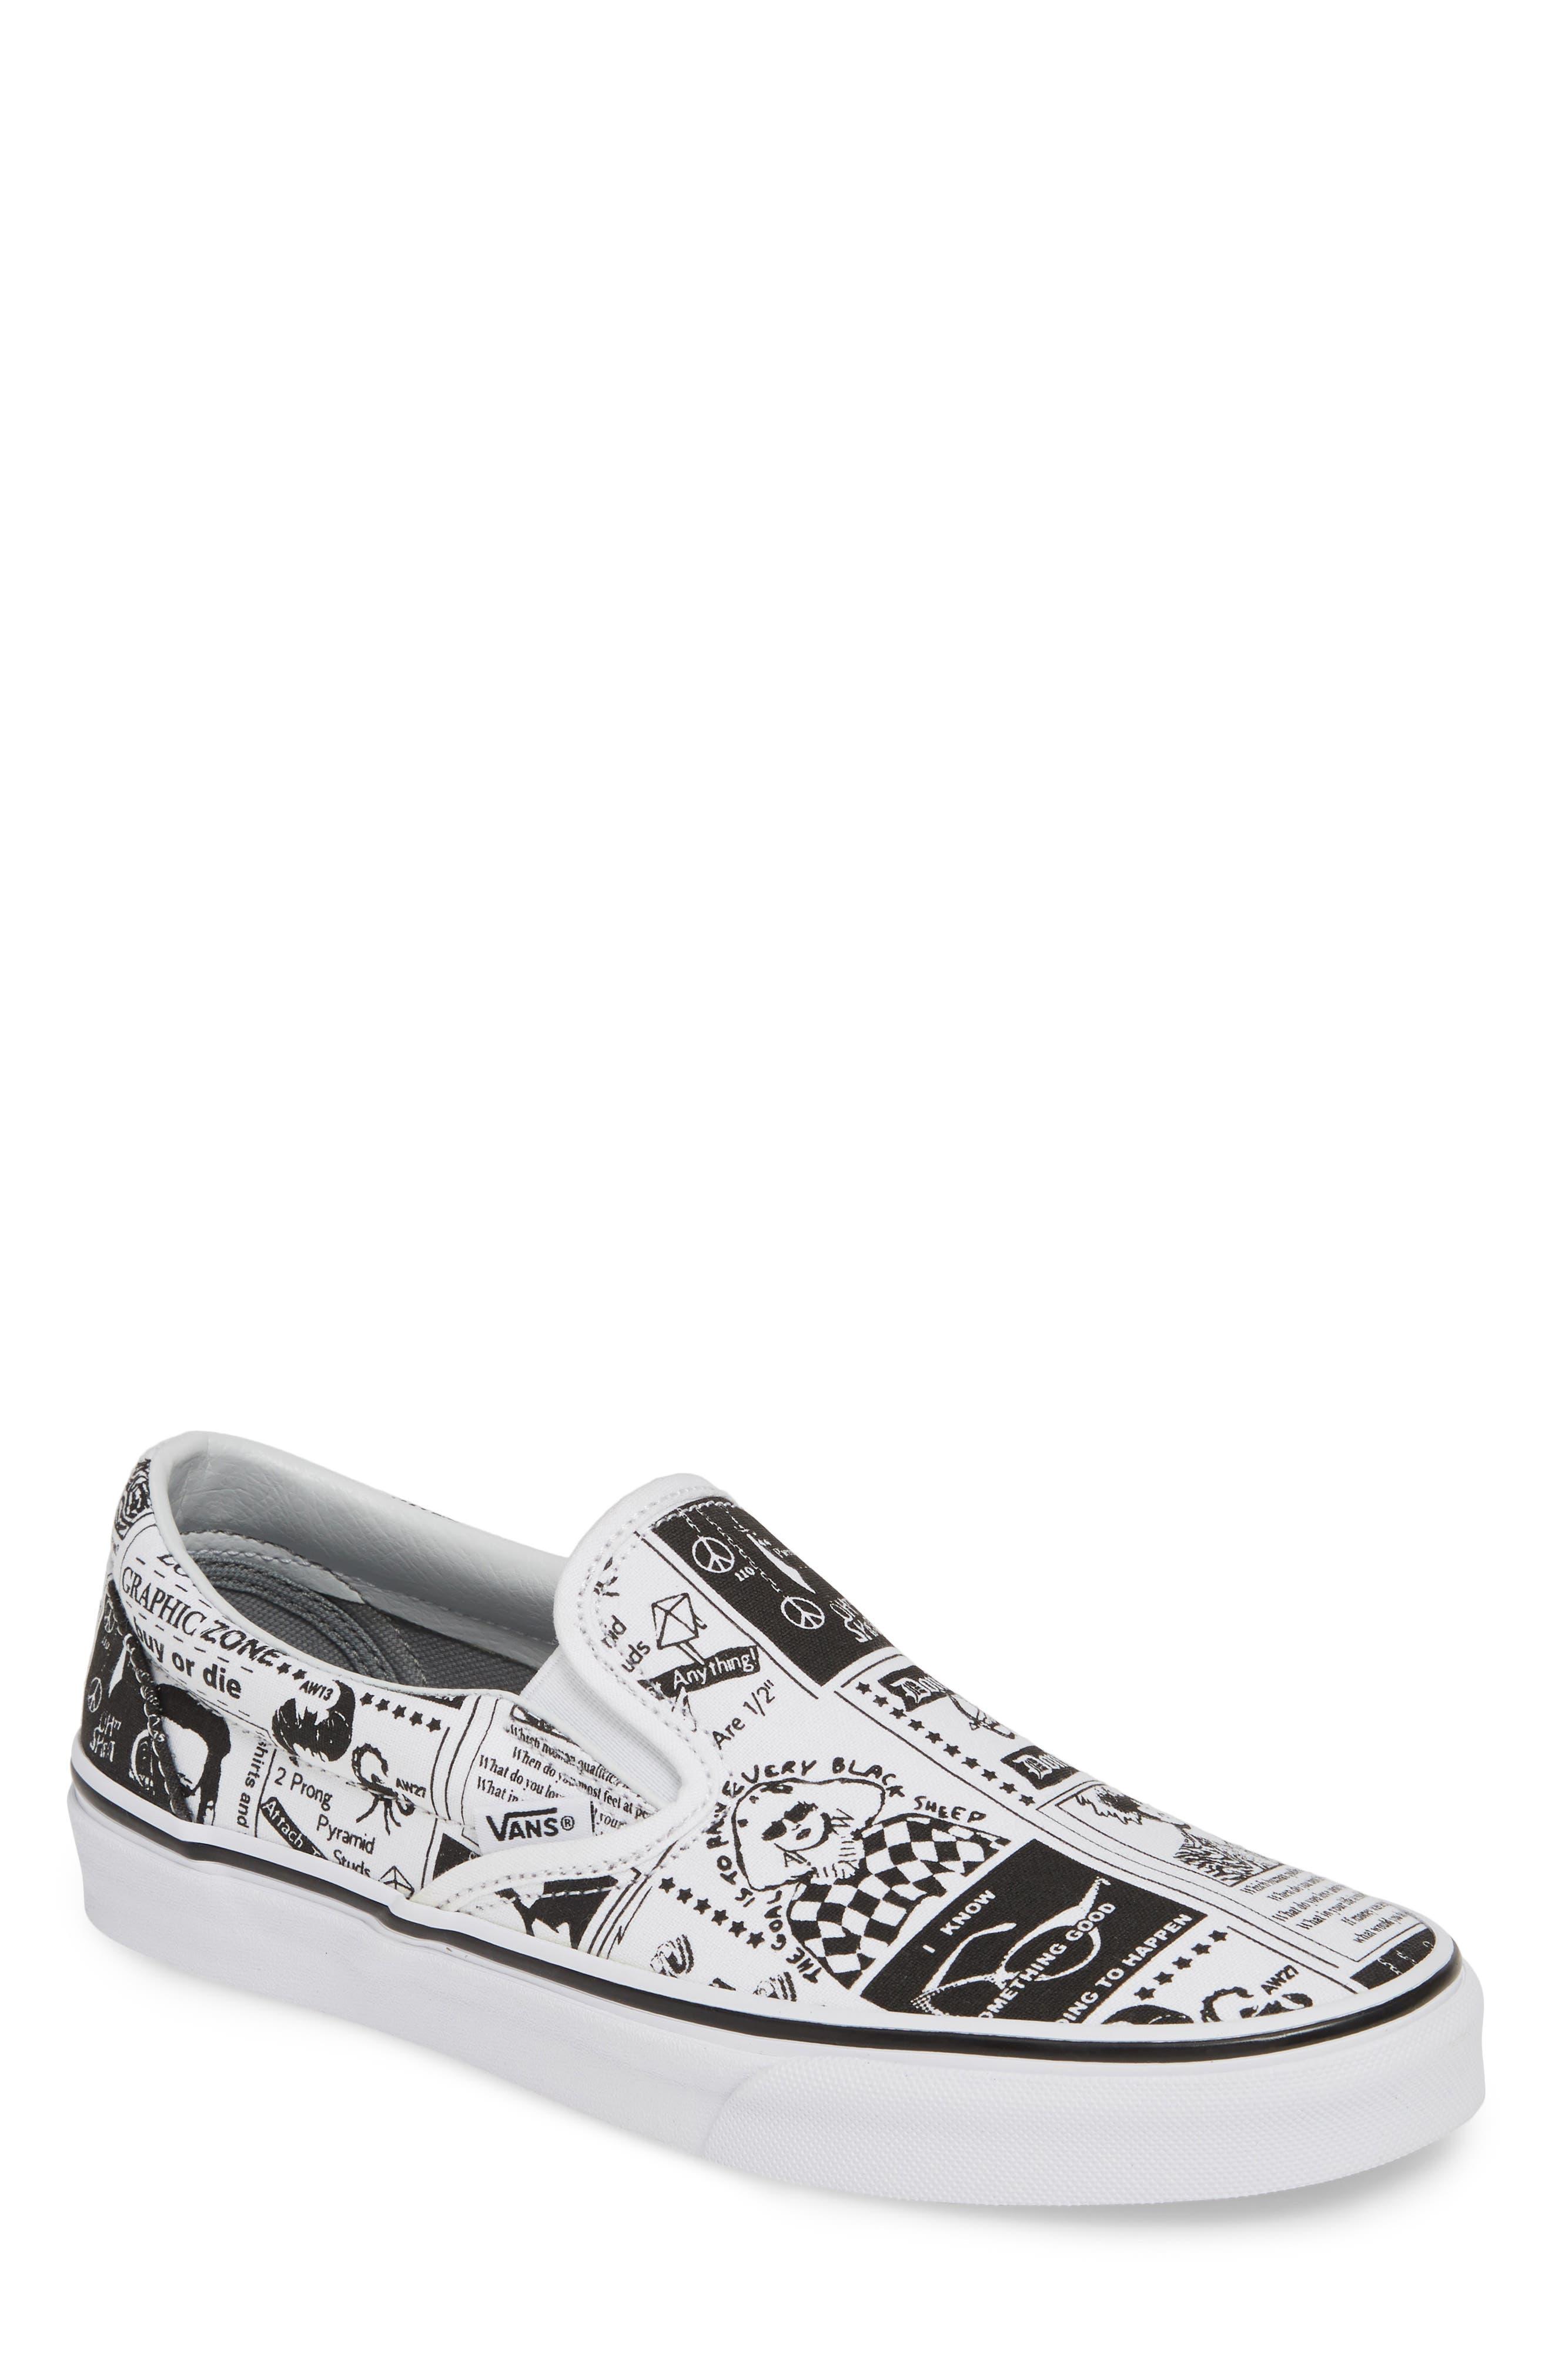 VANS x Ashley Williams Print Classic Slip-On Sneaker, Main, color, 100